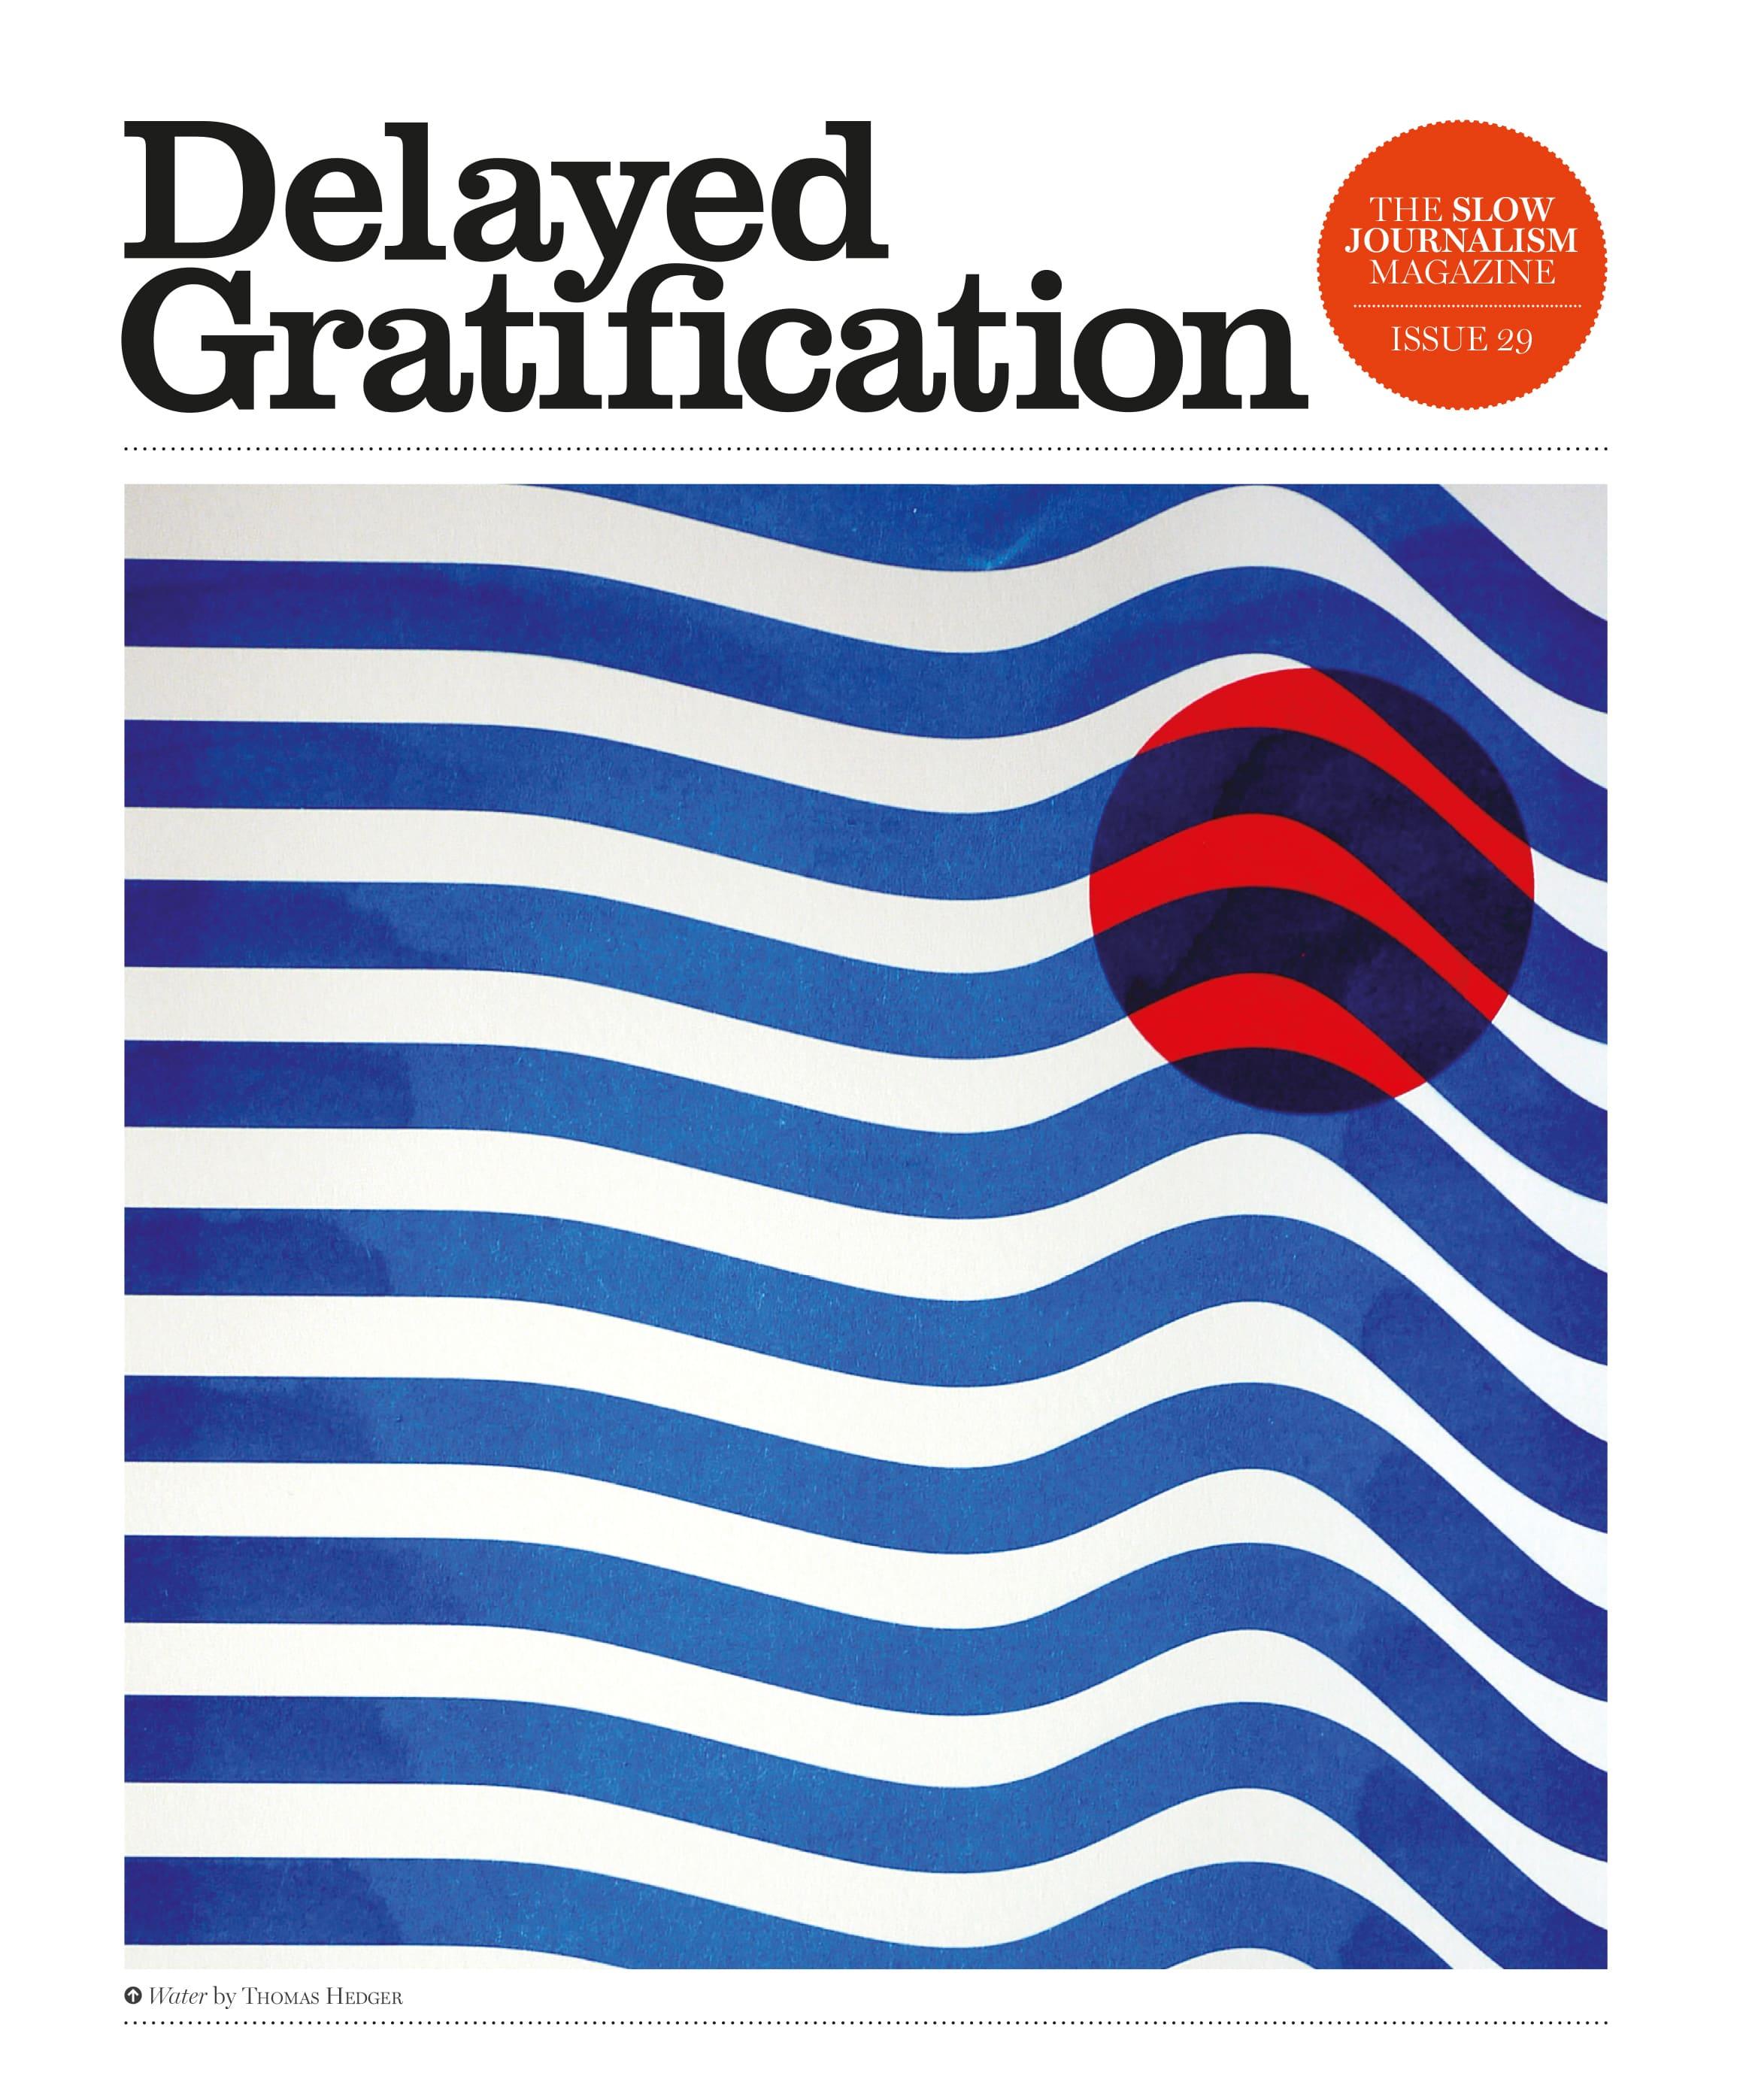 DG29 Cover